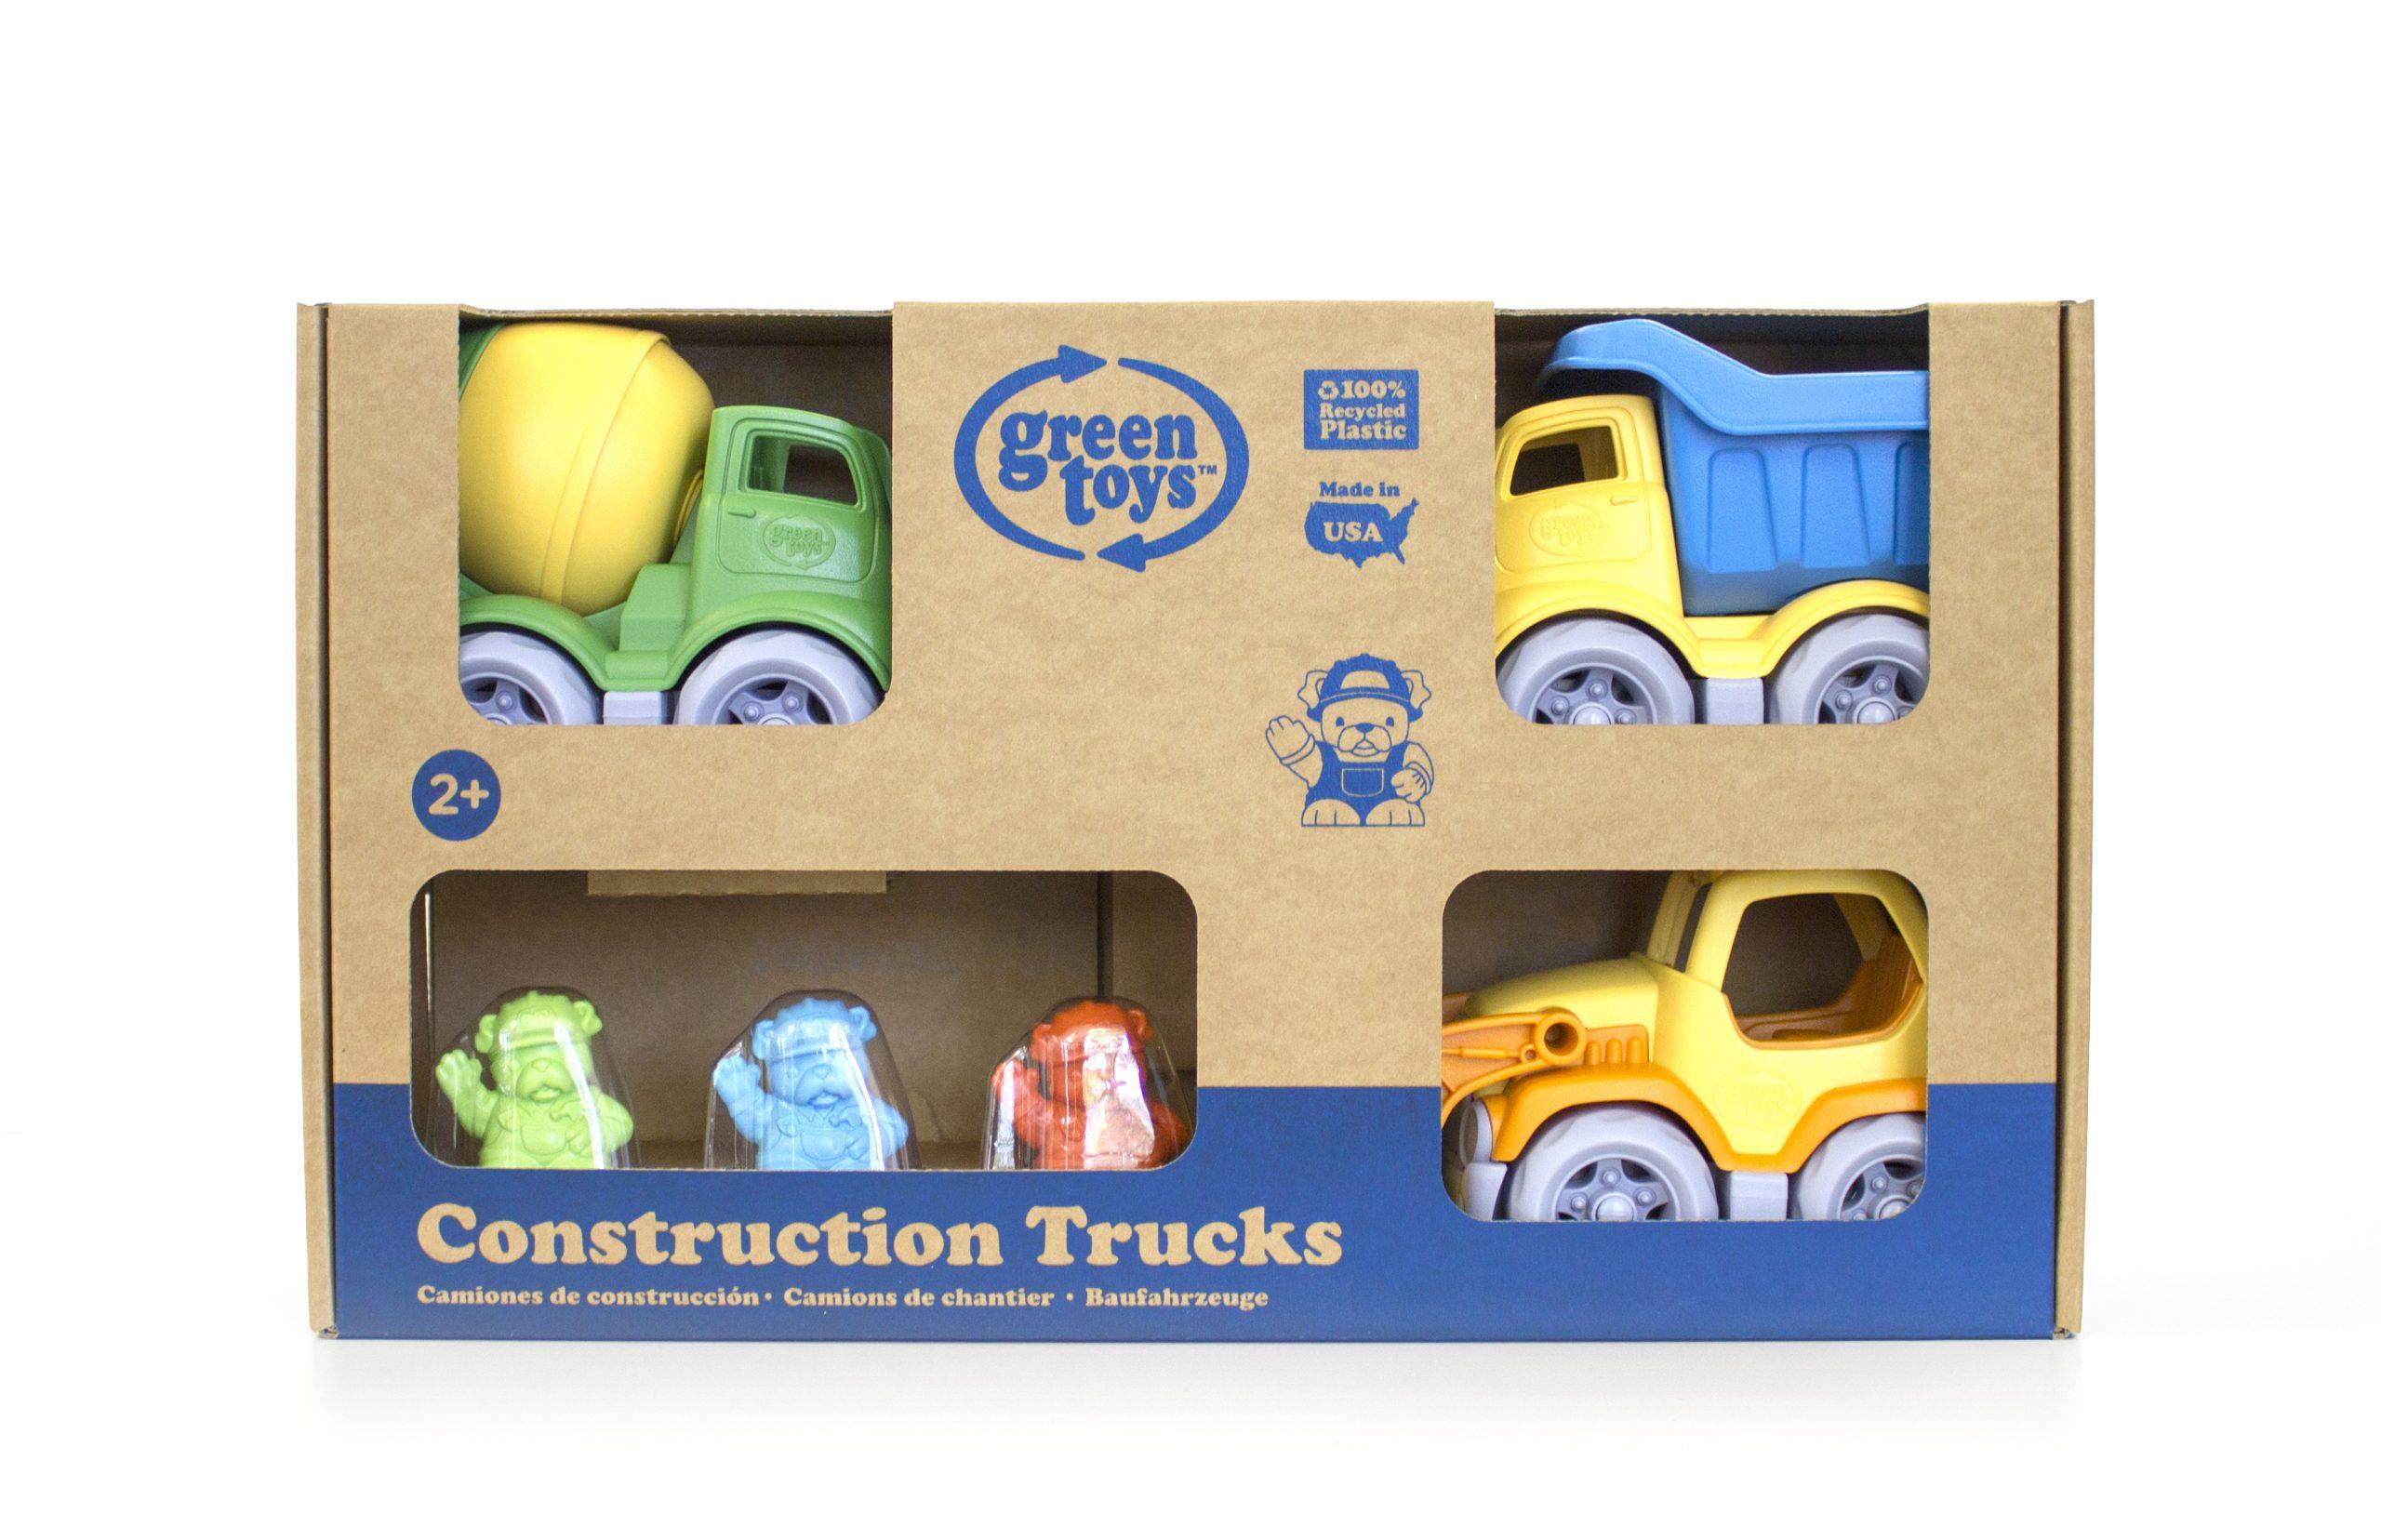 Green Toys: Κατασκευαστικά Οχήματα Σετ 3 τεμαχίων CST3-1209